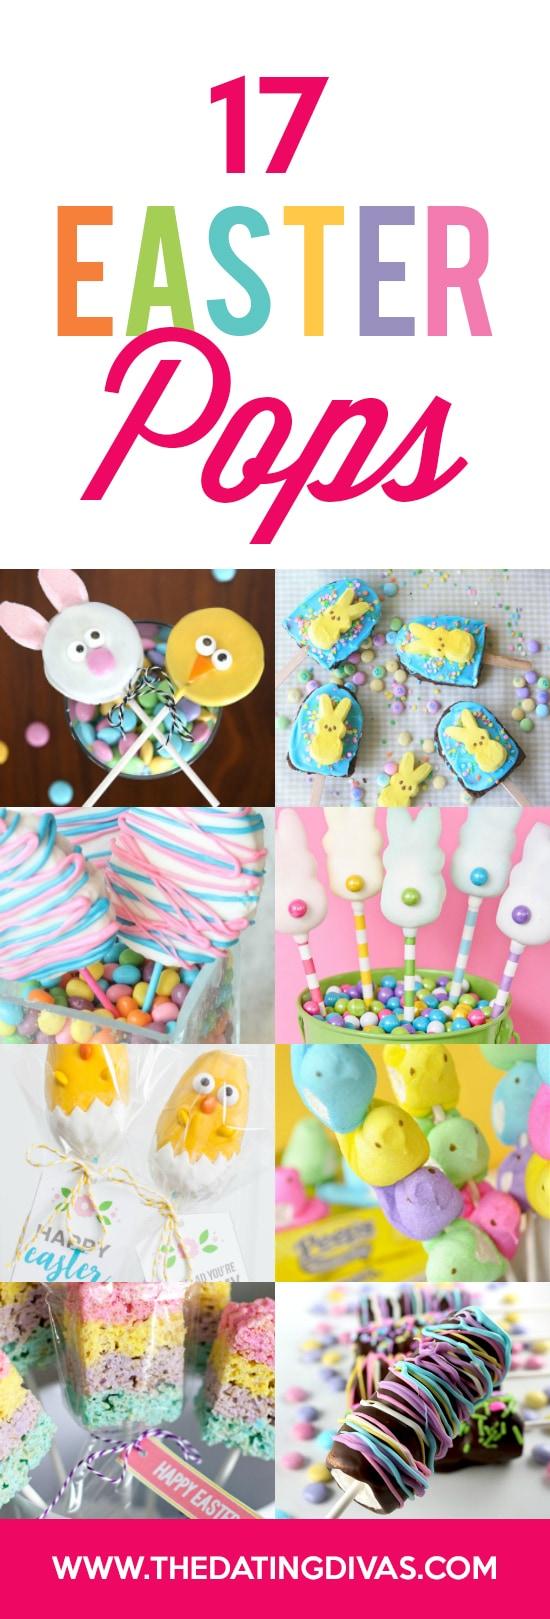 Pops Easter Treats